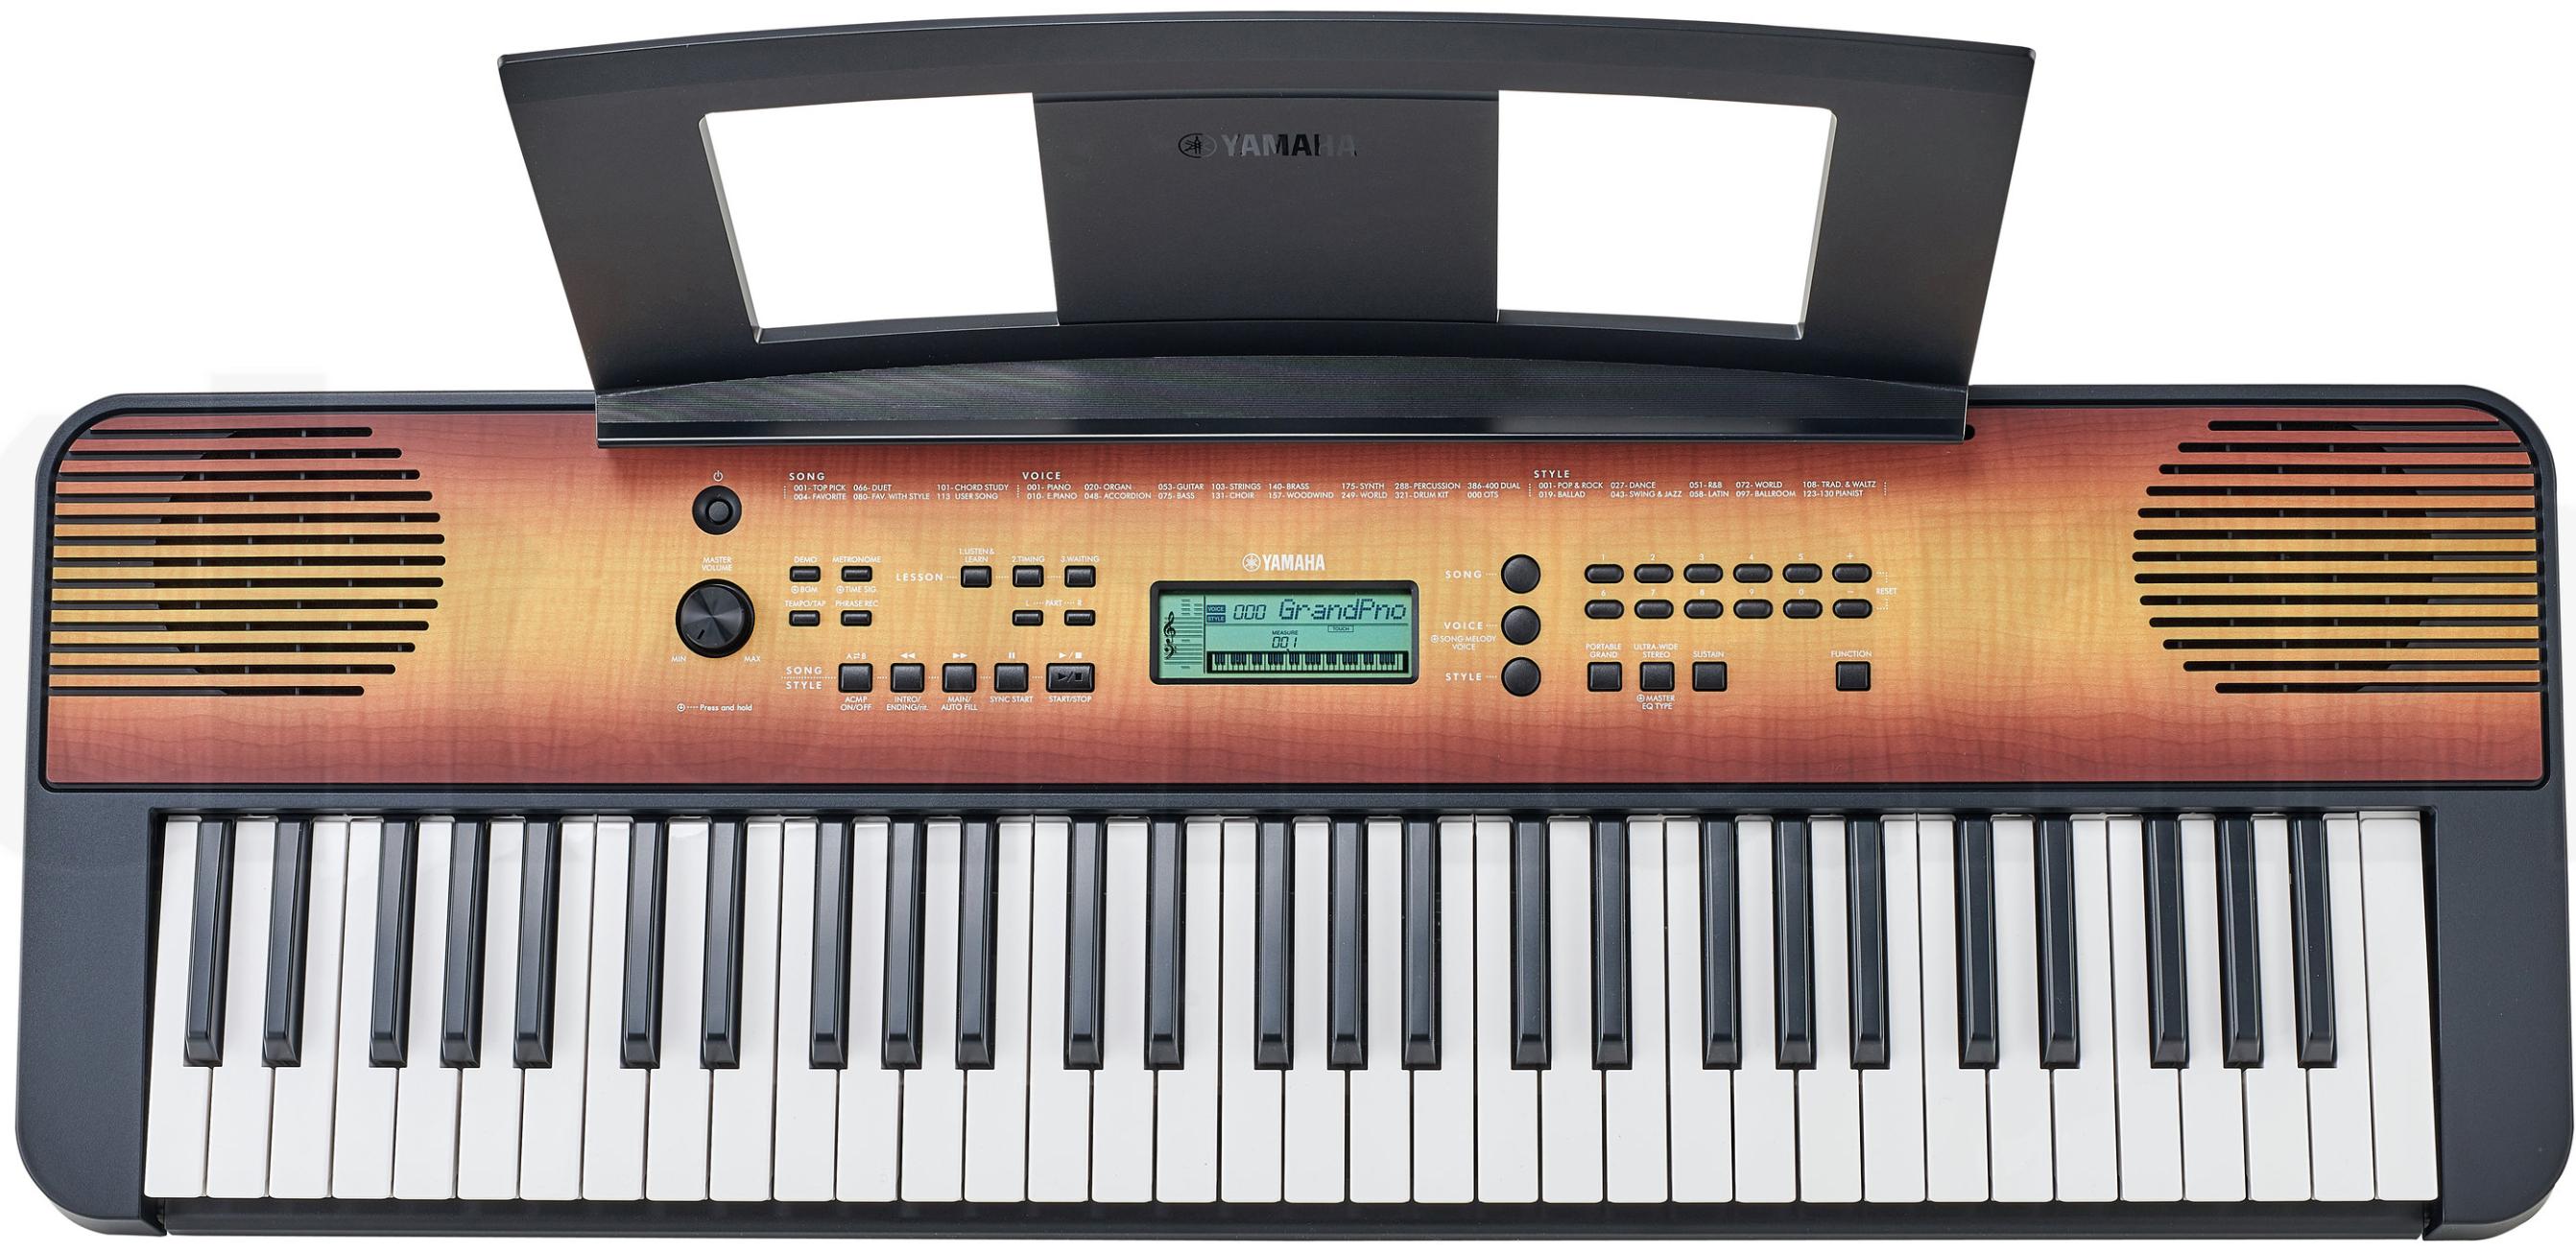 Yamaha Digital Keyboard PSR-E360MA, Ahorn – Digitales Einsteiger-Keyboard mit 61 Tasten mit Anschlagdynamik